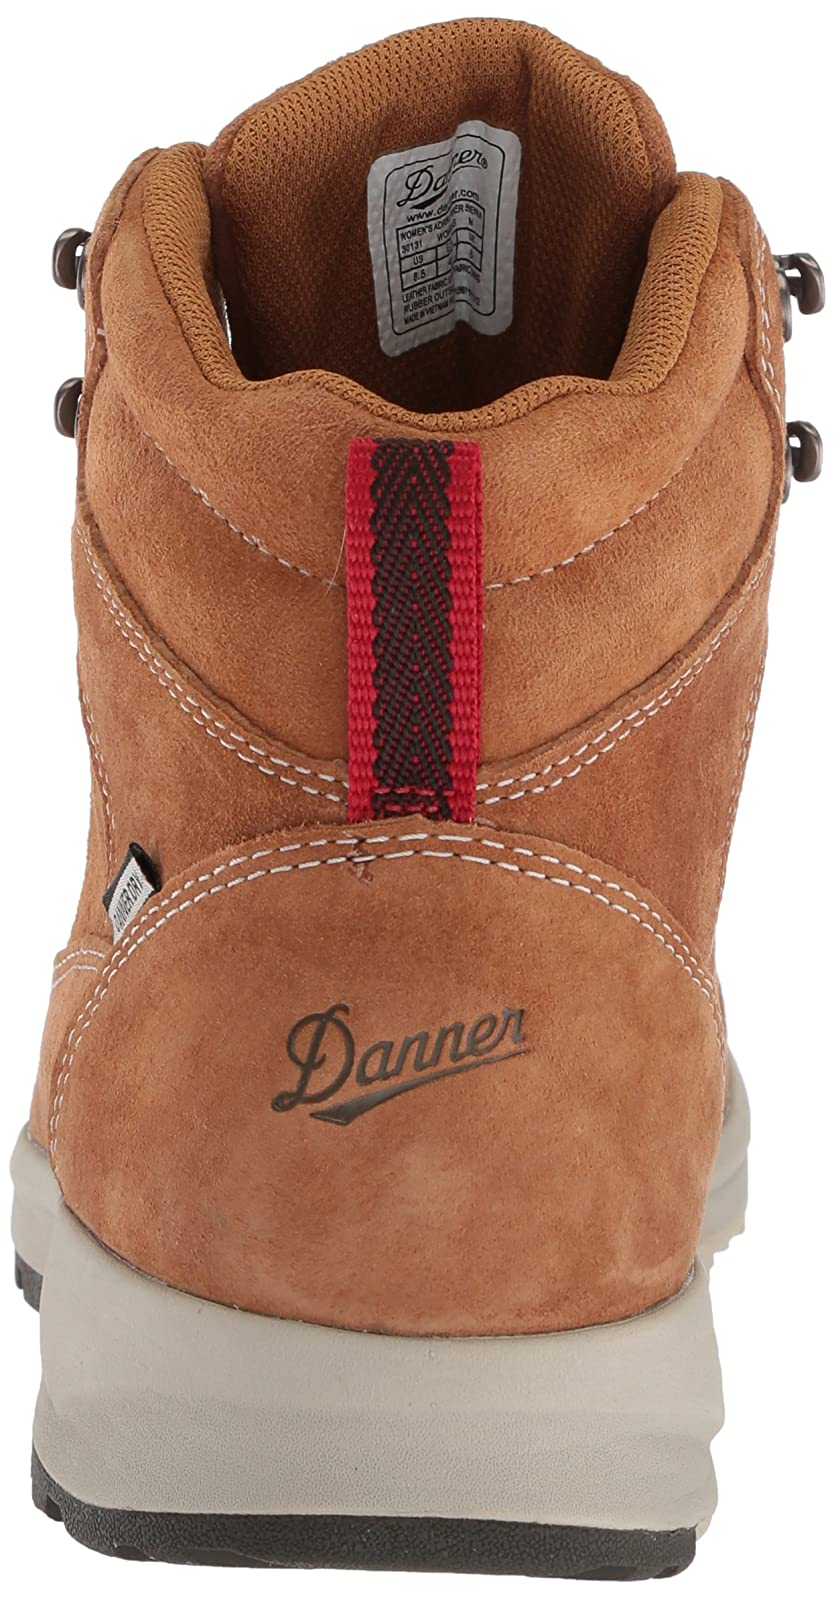 Danner Women's Adrika Hiker Hiking Boot 2 M US Boy - 2